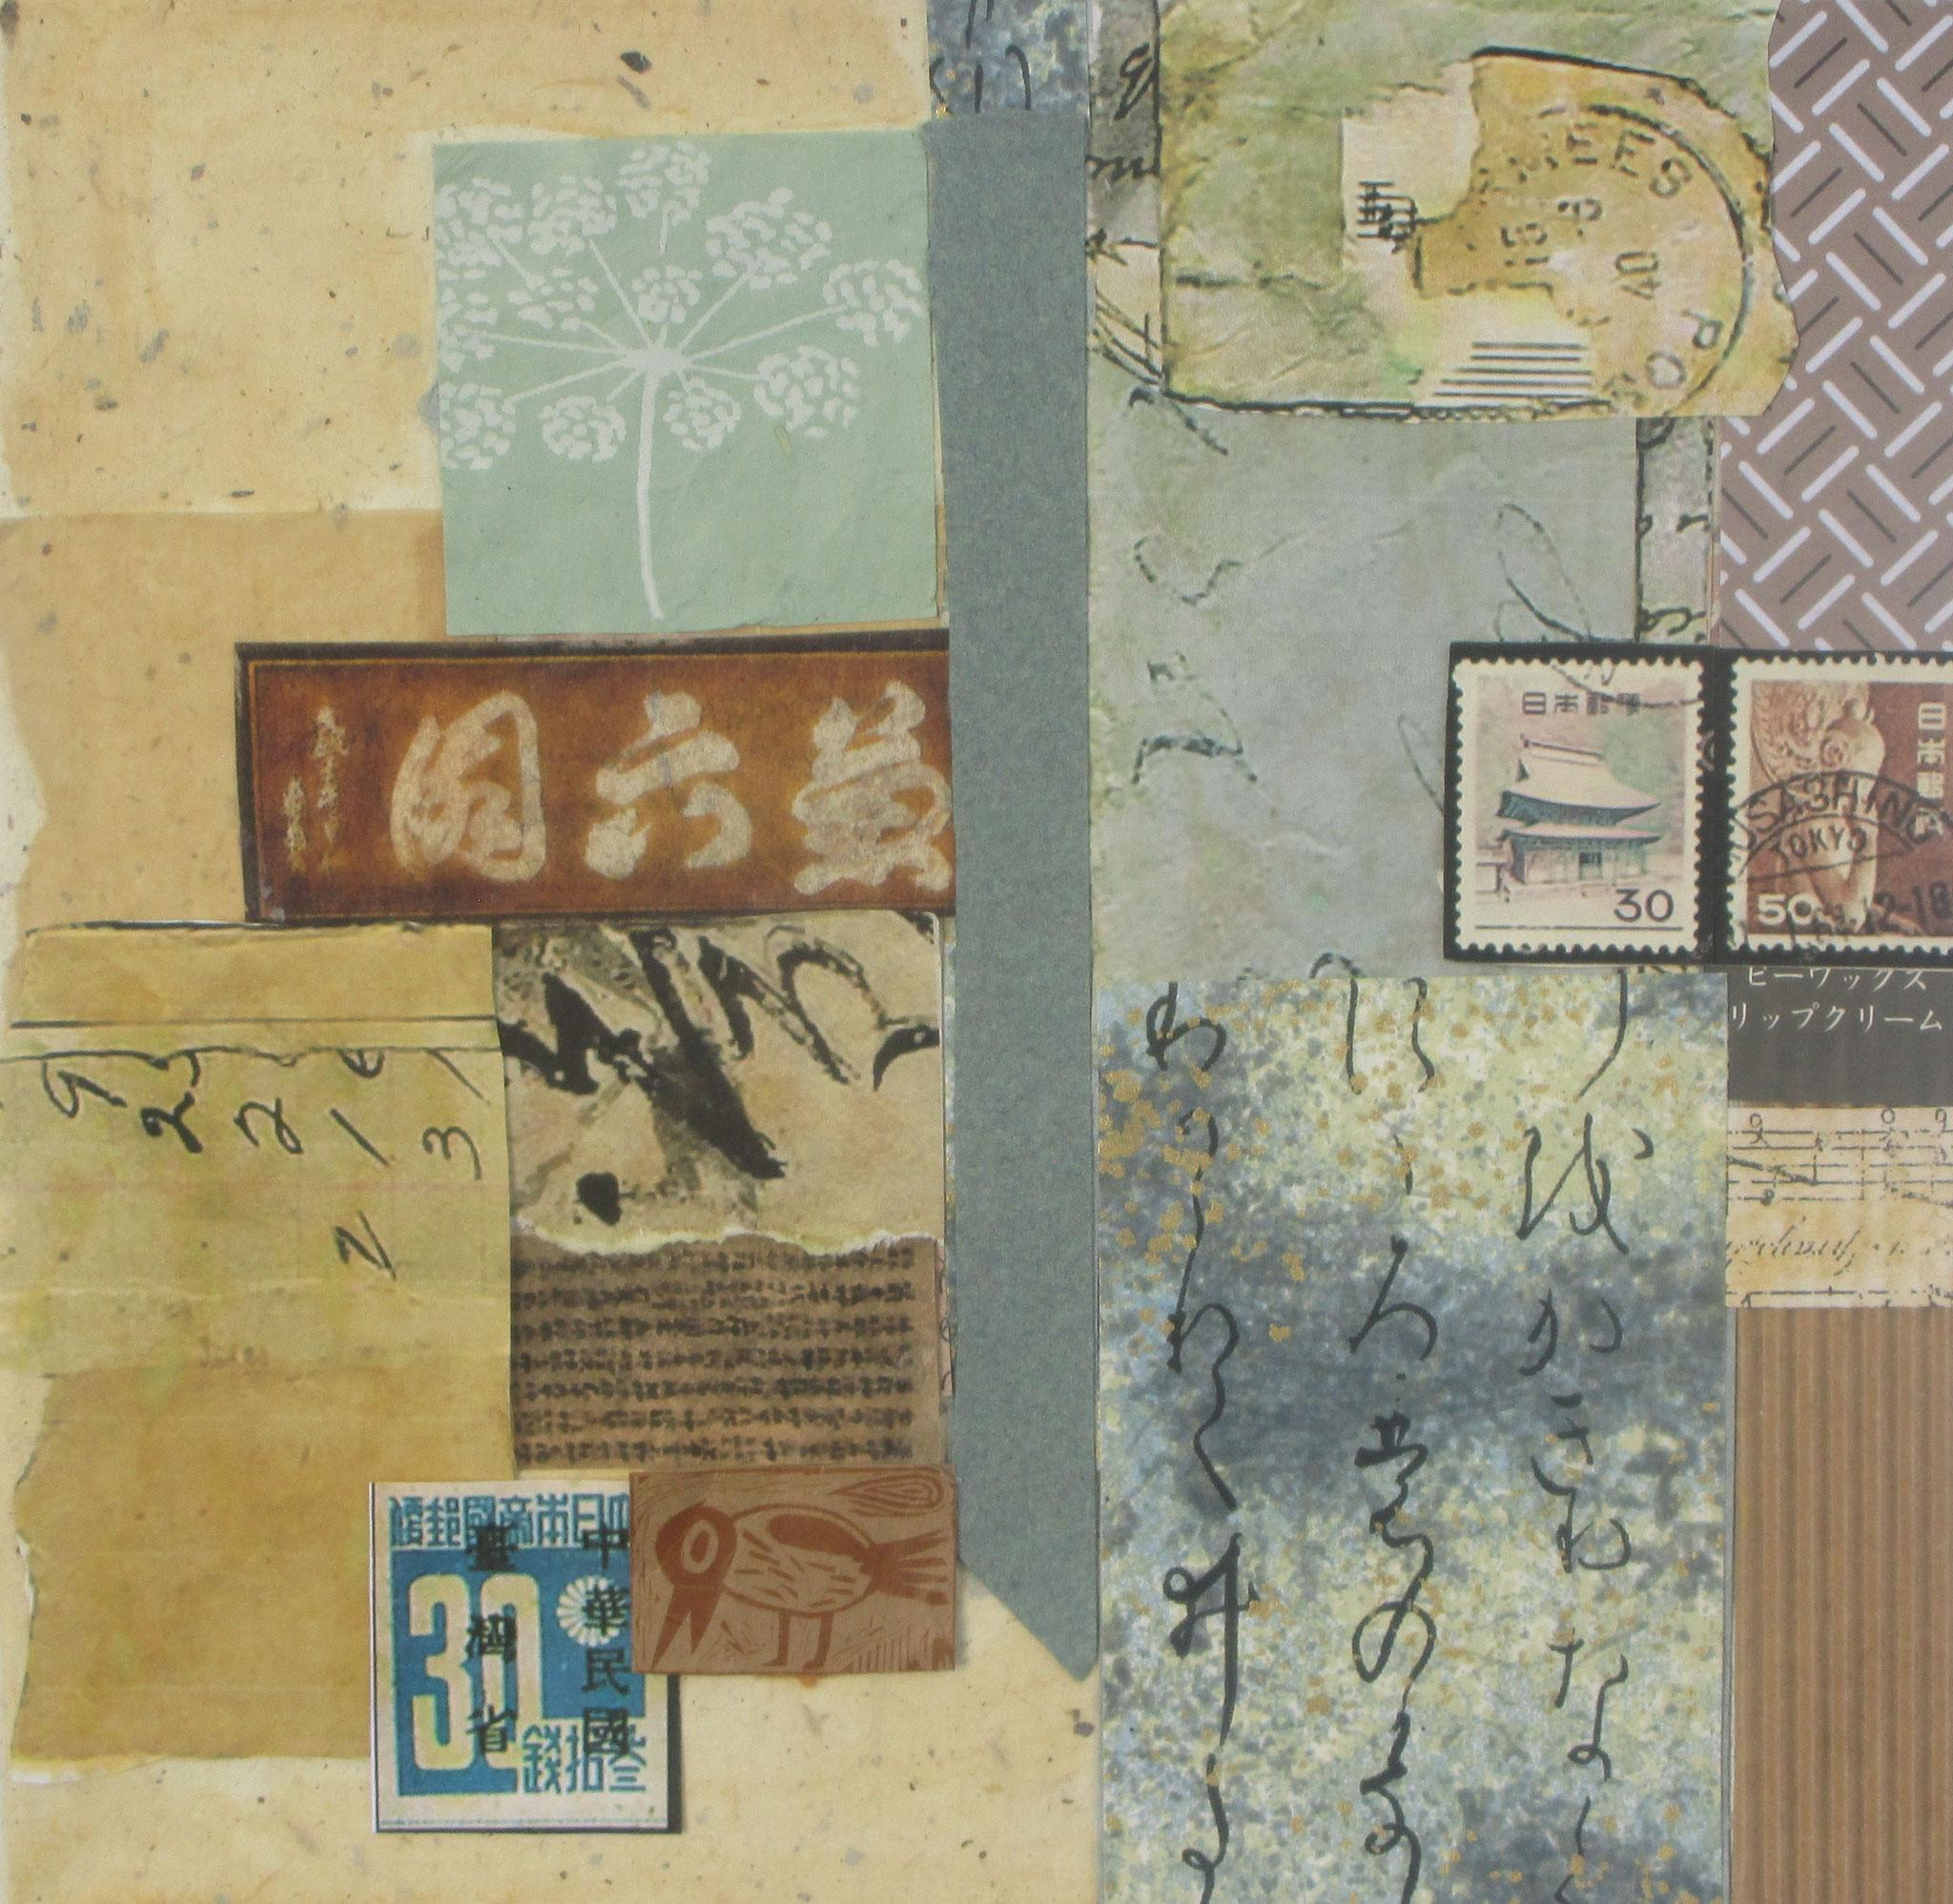 Bird Song, Tori no Uta, Washi paper, ink, 10 x 10, SOLD